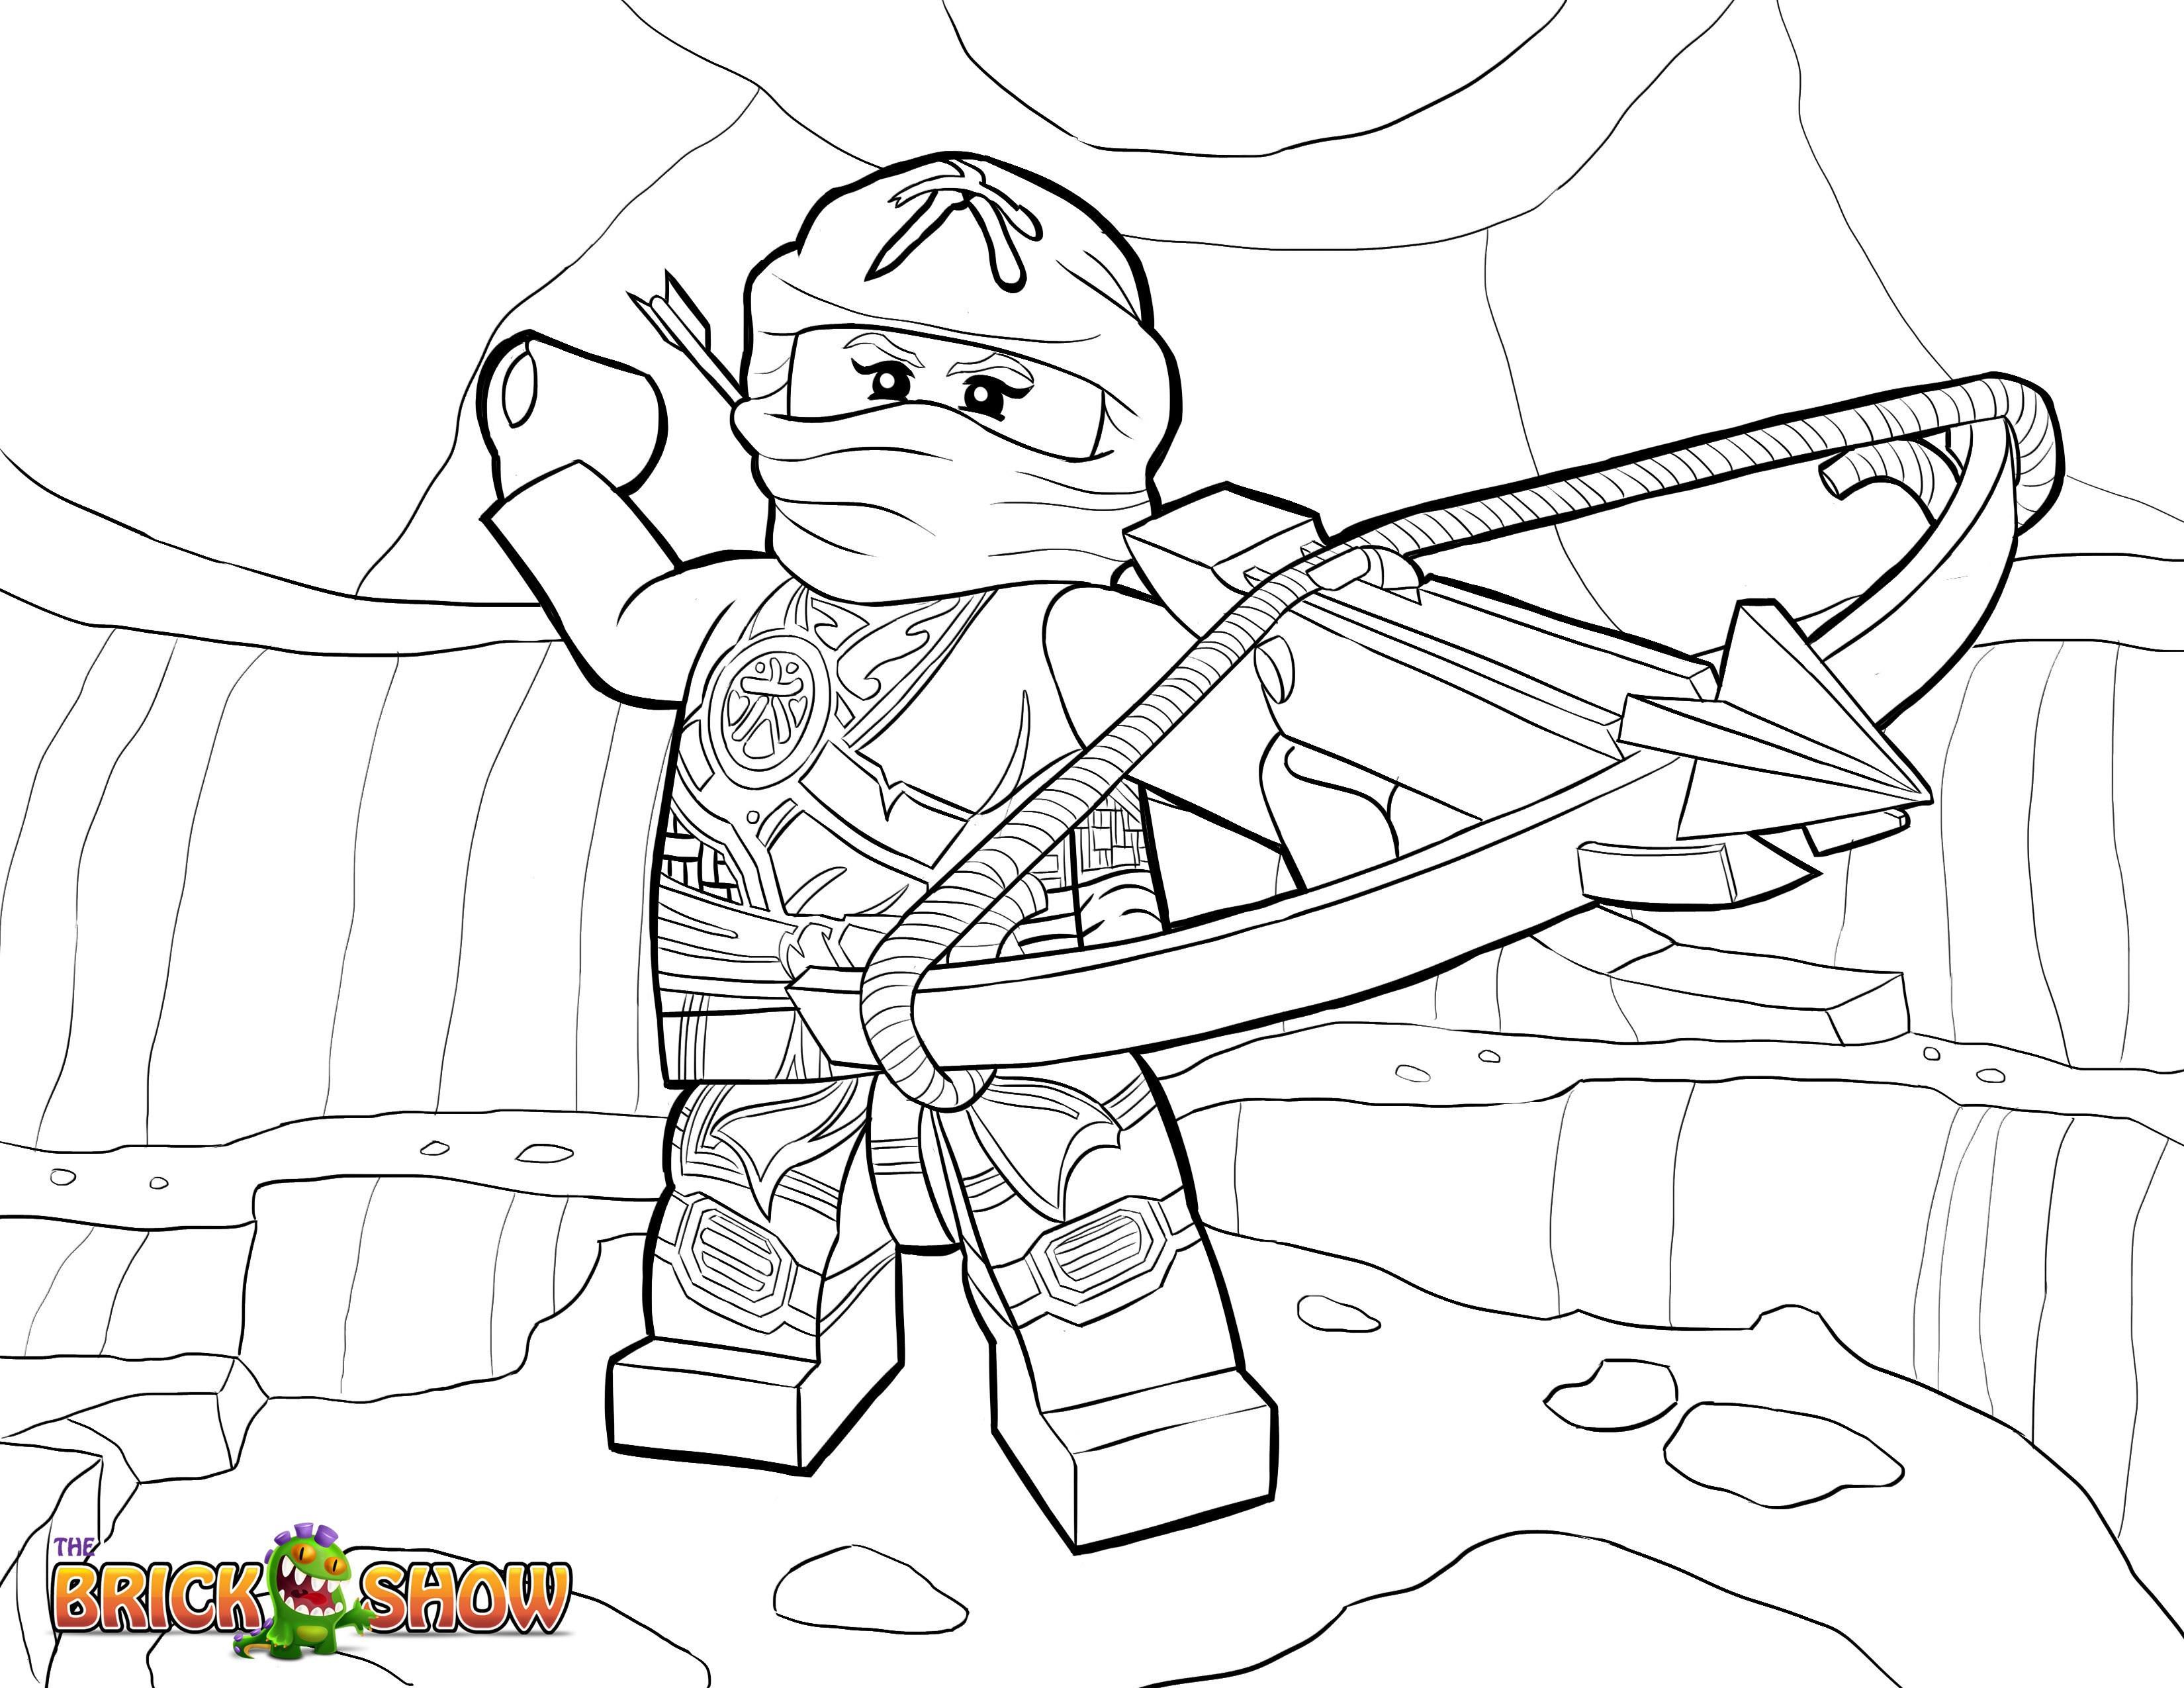 Ninjago Lloyd Ausmalbild Einzigartig Ausmalbilder Lego Ninjago Morro Schön Malvorlagen Ninjago Lloyd Neu Galerie